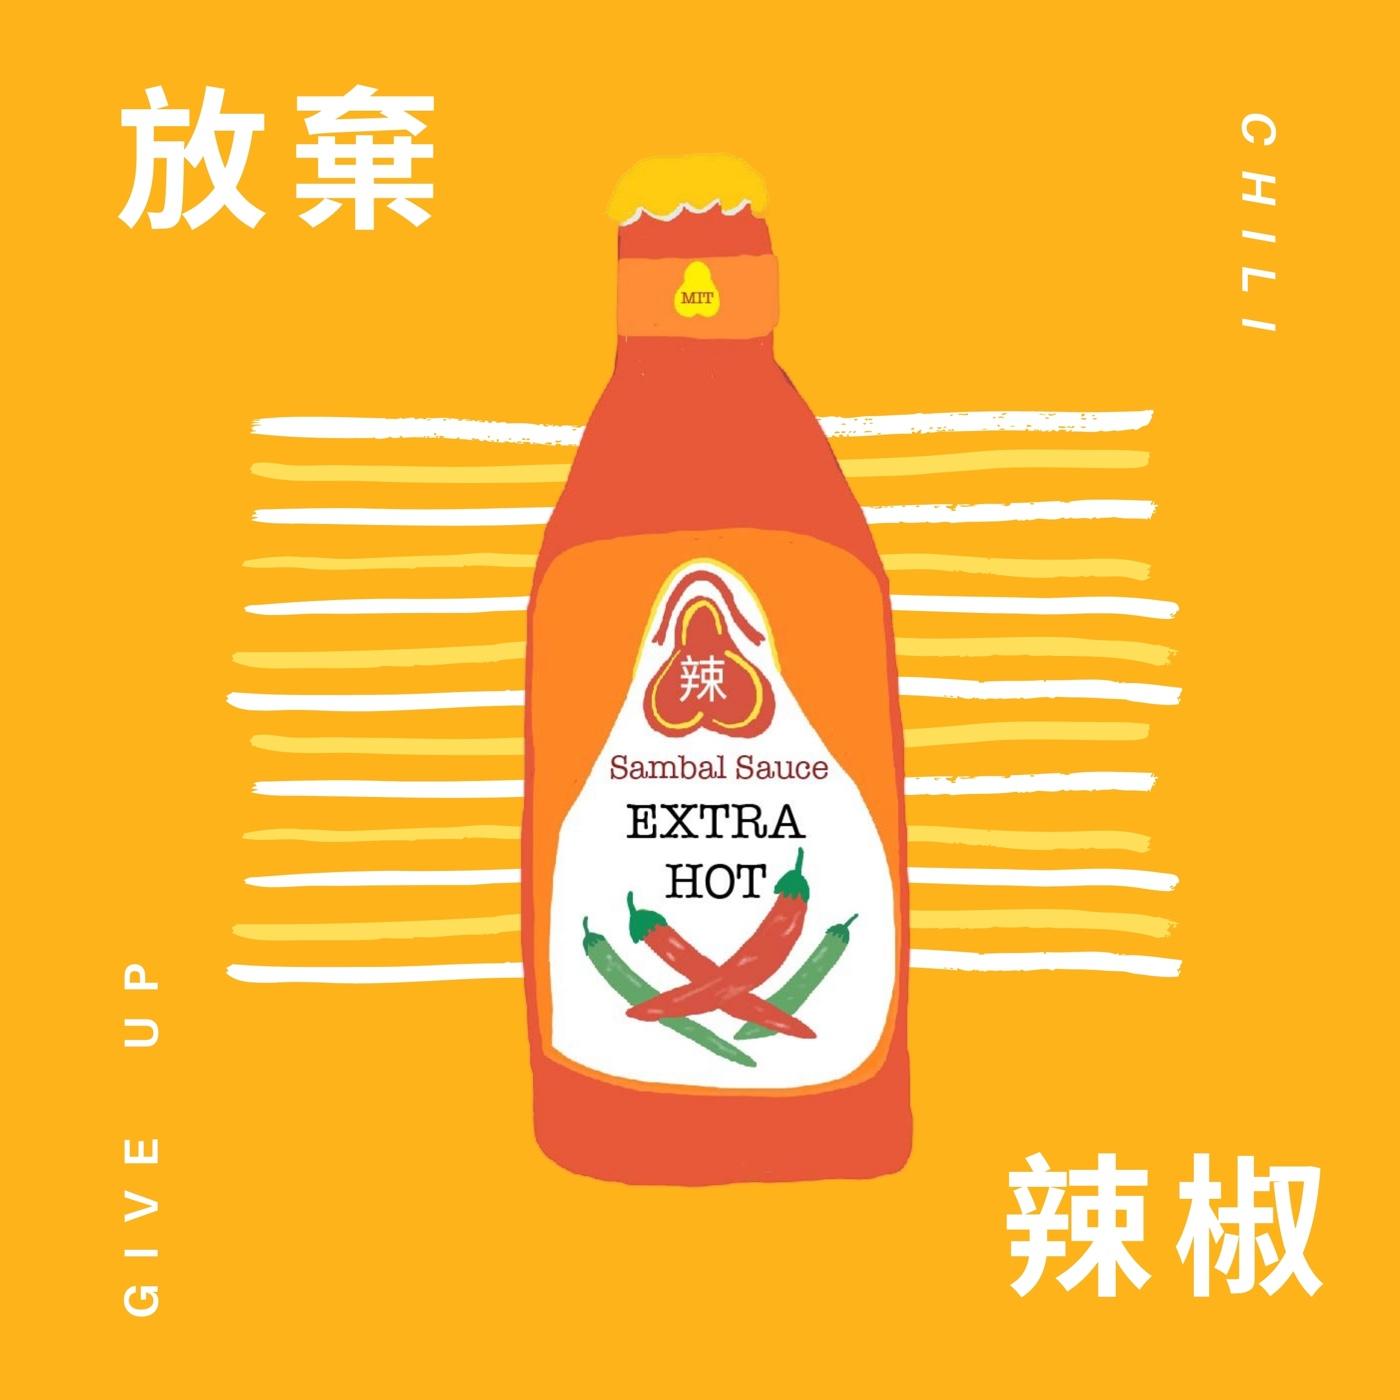 EP4:【北漂青年特輯】換換愛之台北語言交換 Feat. Andre Wijaya